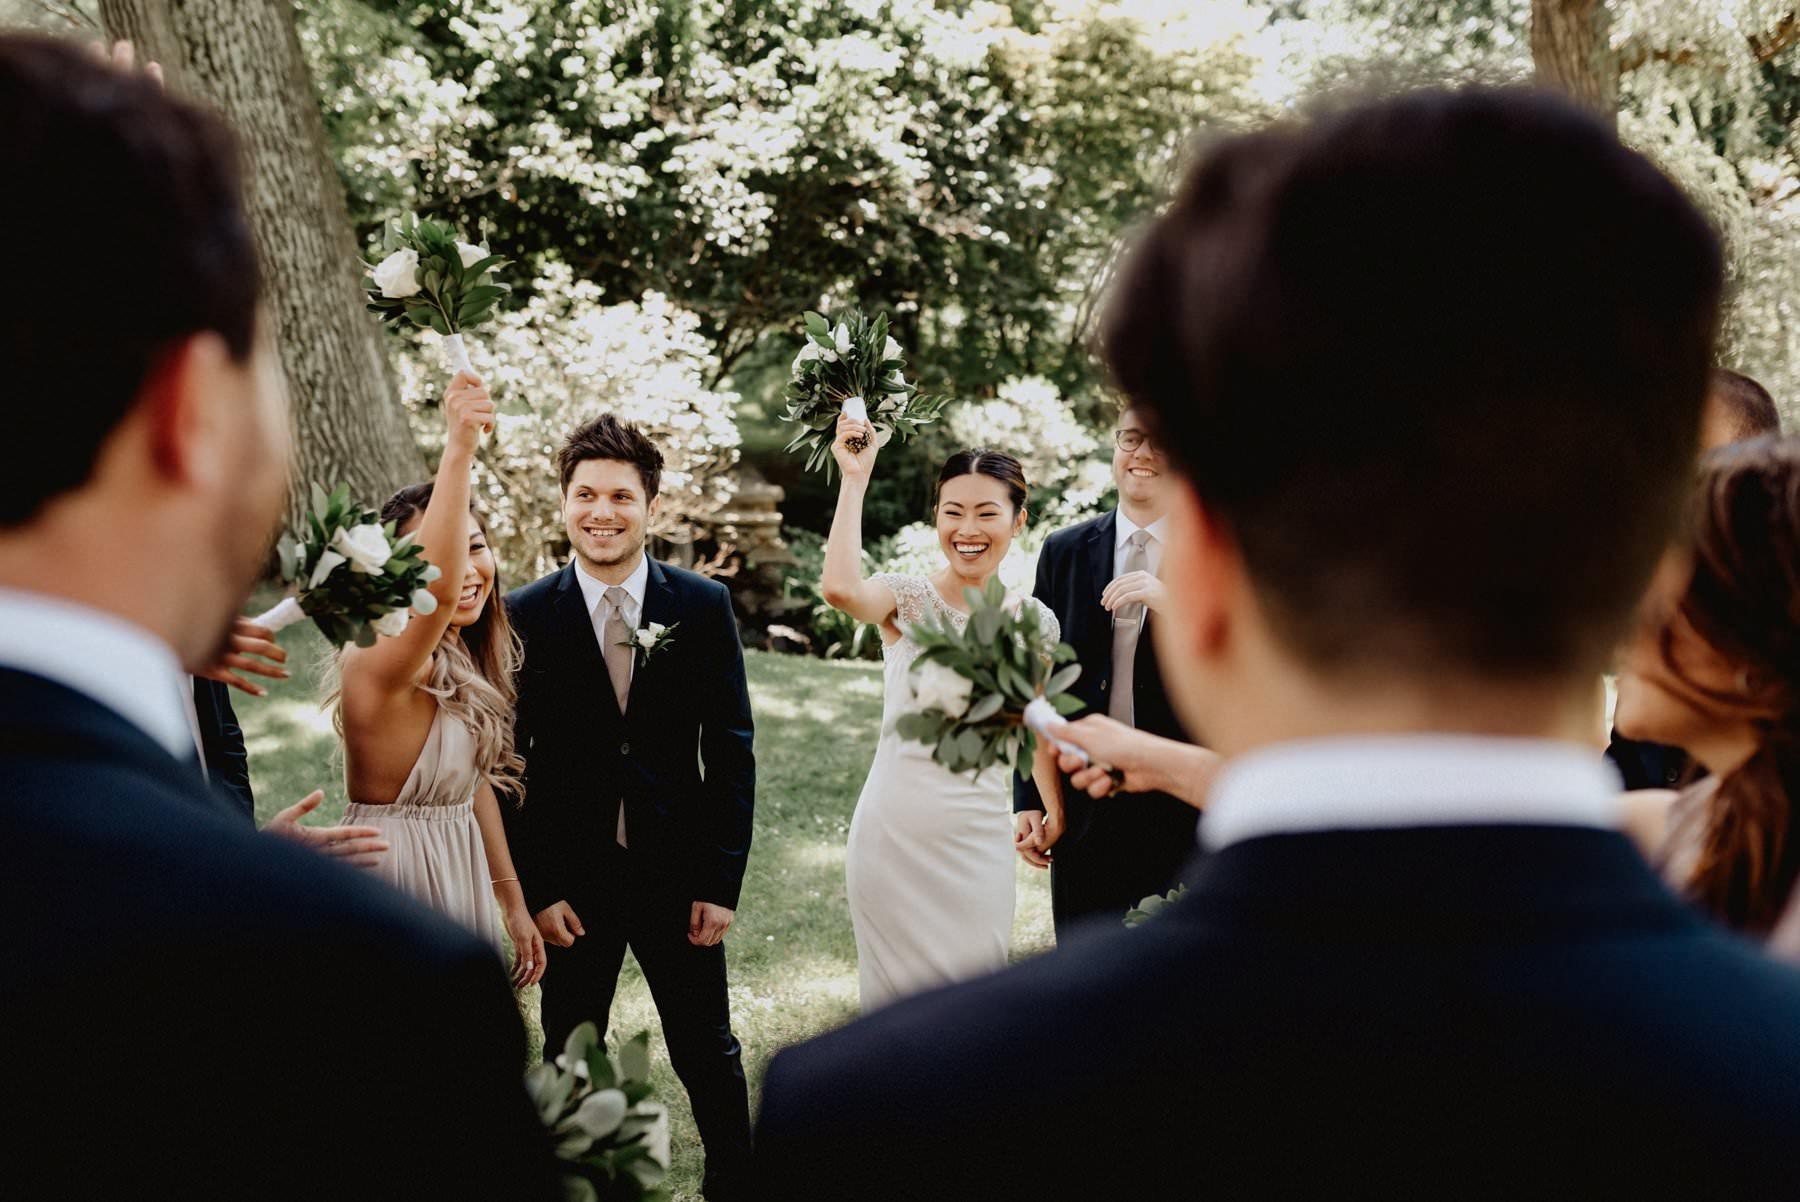 Appleford-estate-wedding-54.jpg